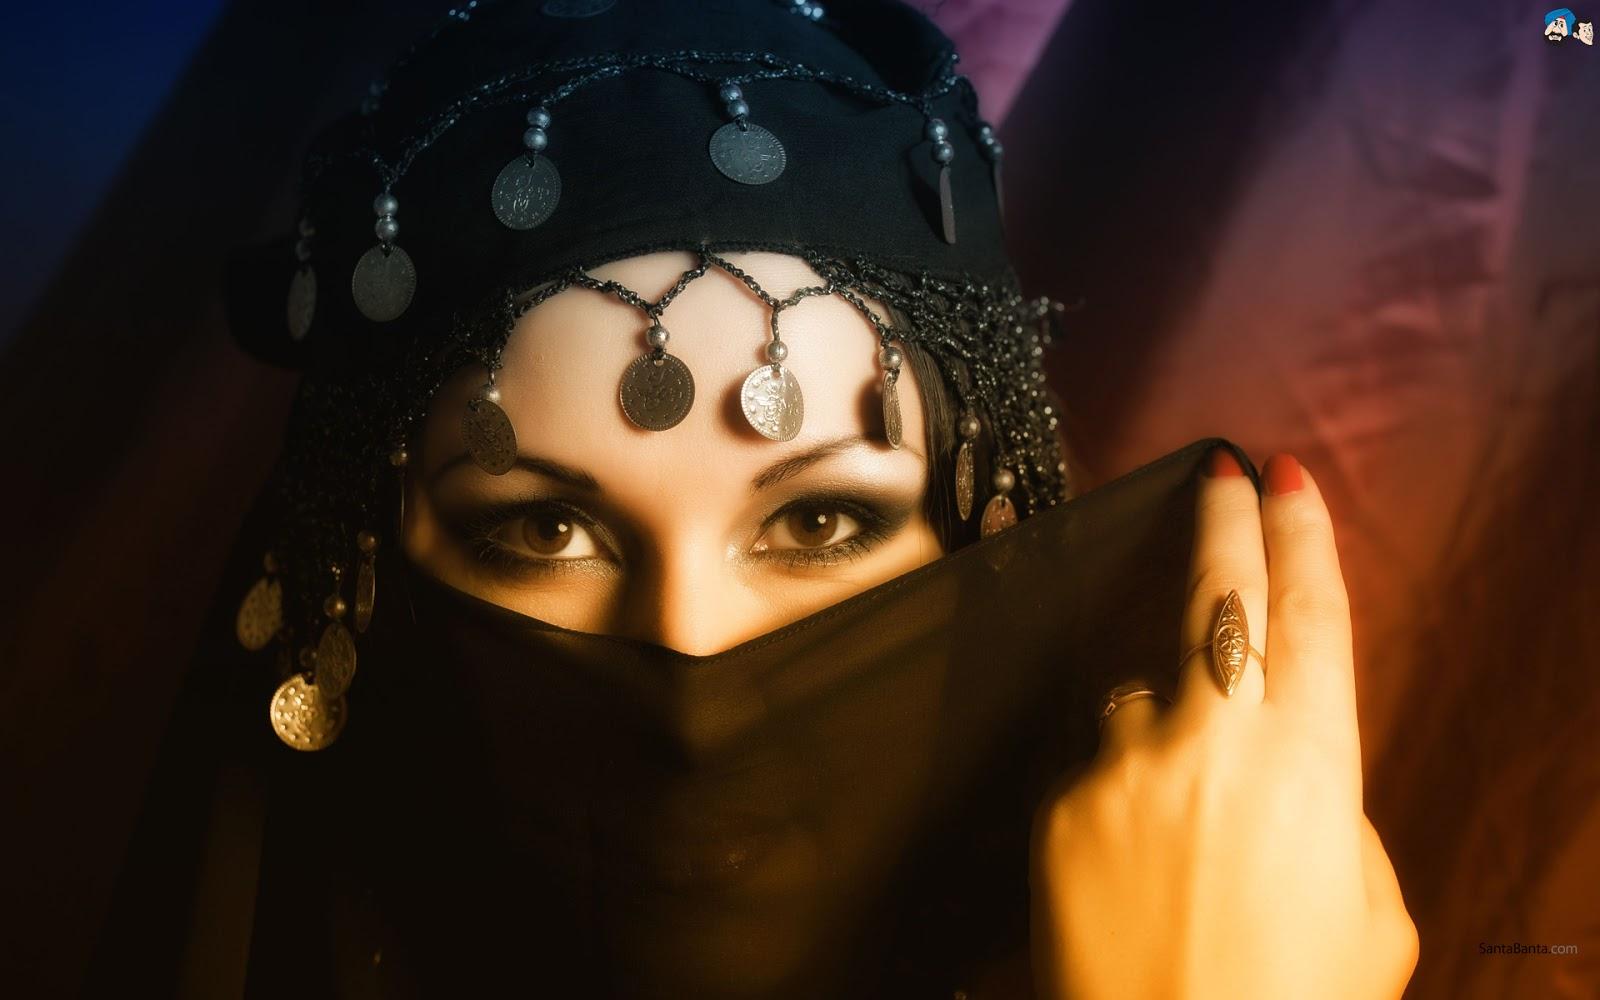 http://4.bp.blogspot.com/-3zJuoglaGc0/UT_FKkwnQbI/AAAAAAAABLI/8biSRdnBpAE/s1600/Wanita+Muslimah+Bercadar+-+Arab+Woman+In+Hijab+HD+Wallpaper+(12).jpg